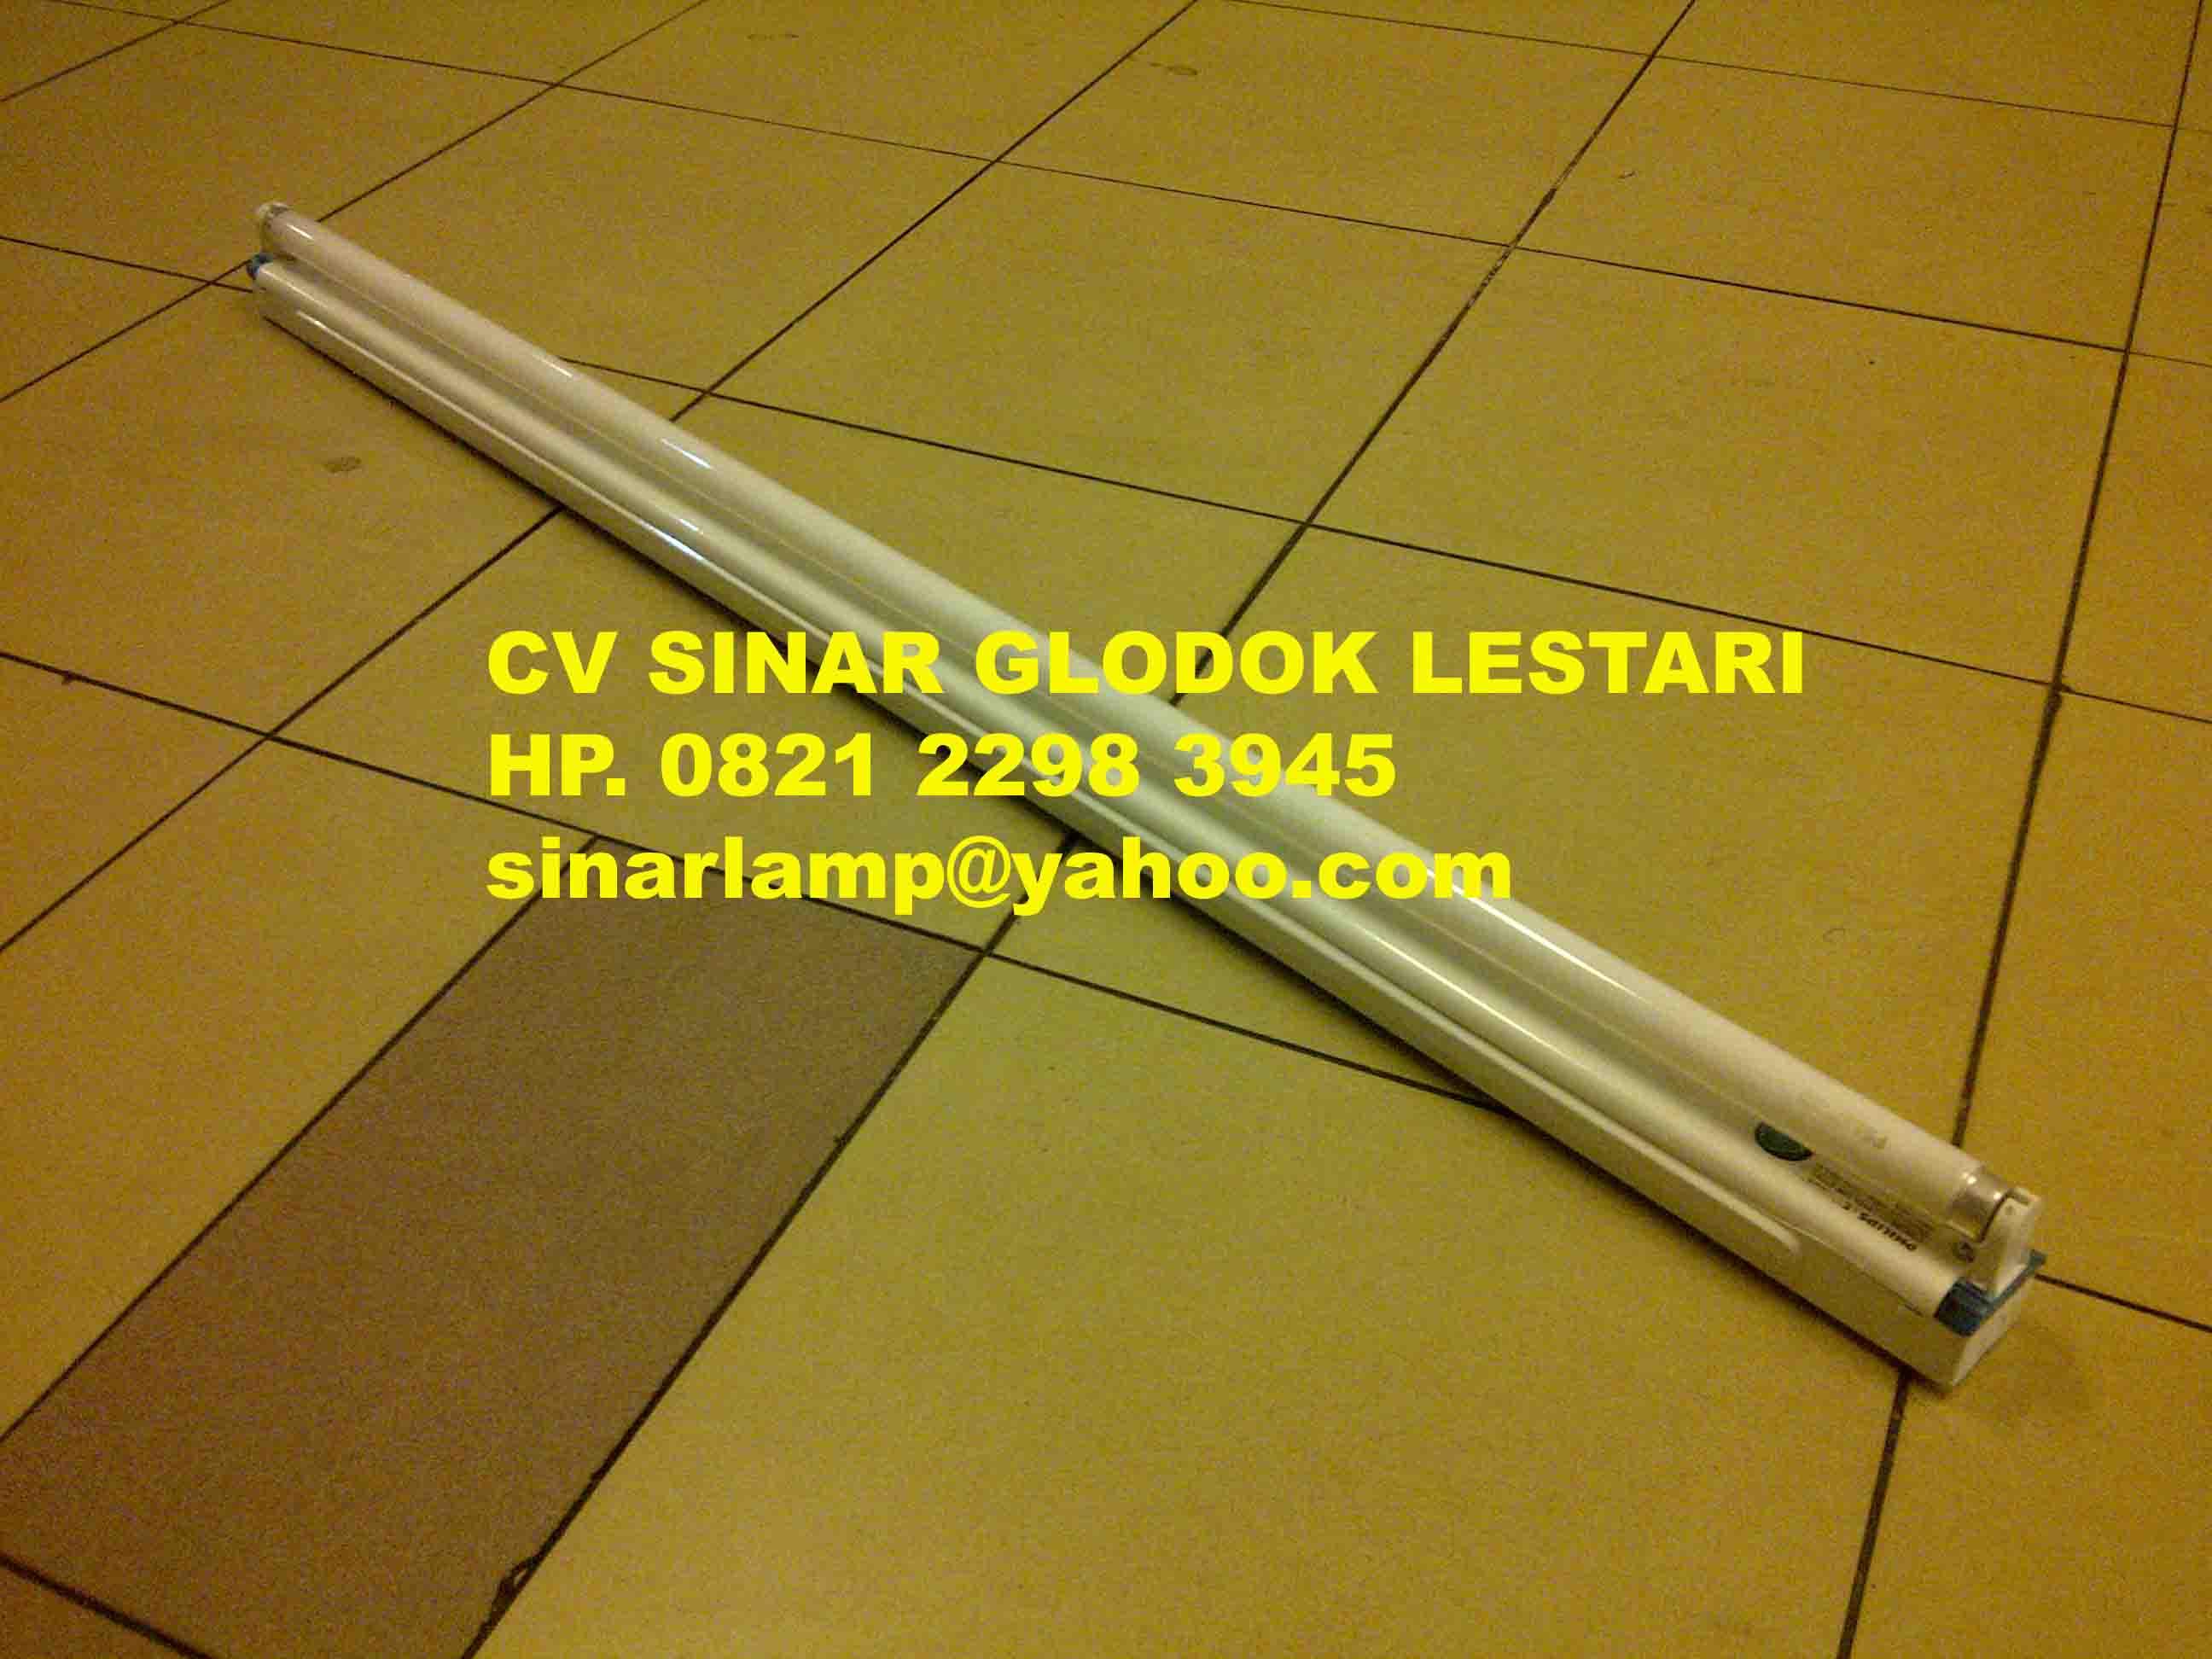 Kap Lampu TL Balok Simbat 36W TMS012 PHILIPS